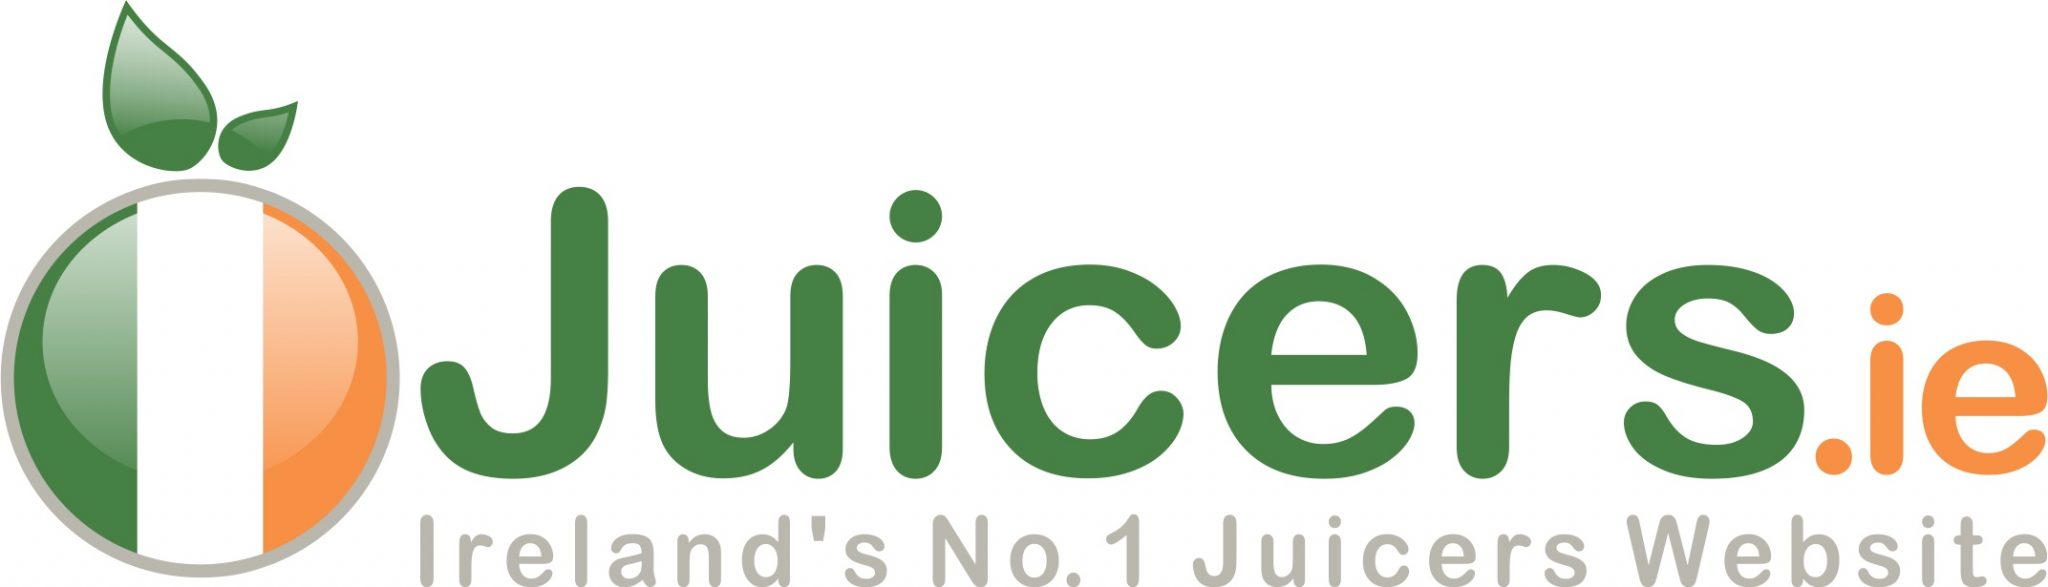 food processors ireland juicers online